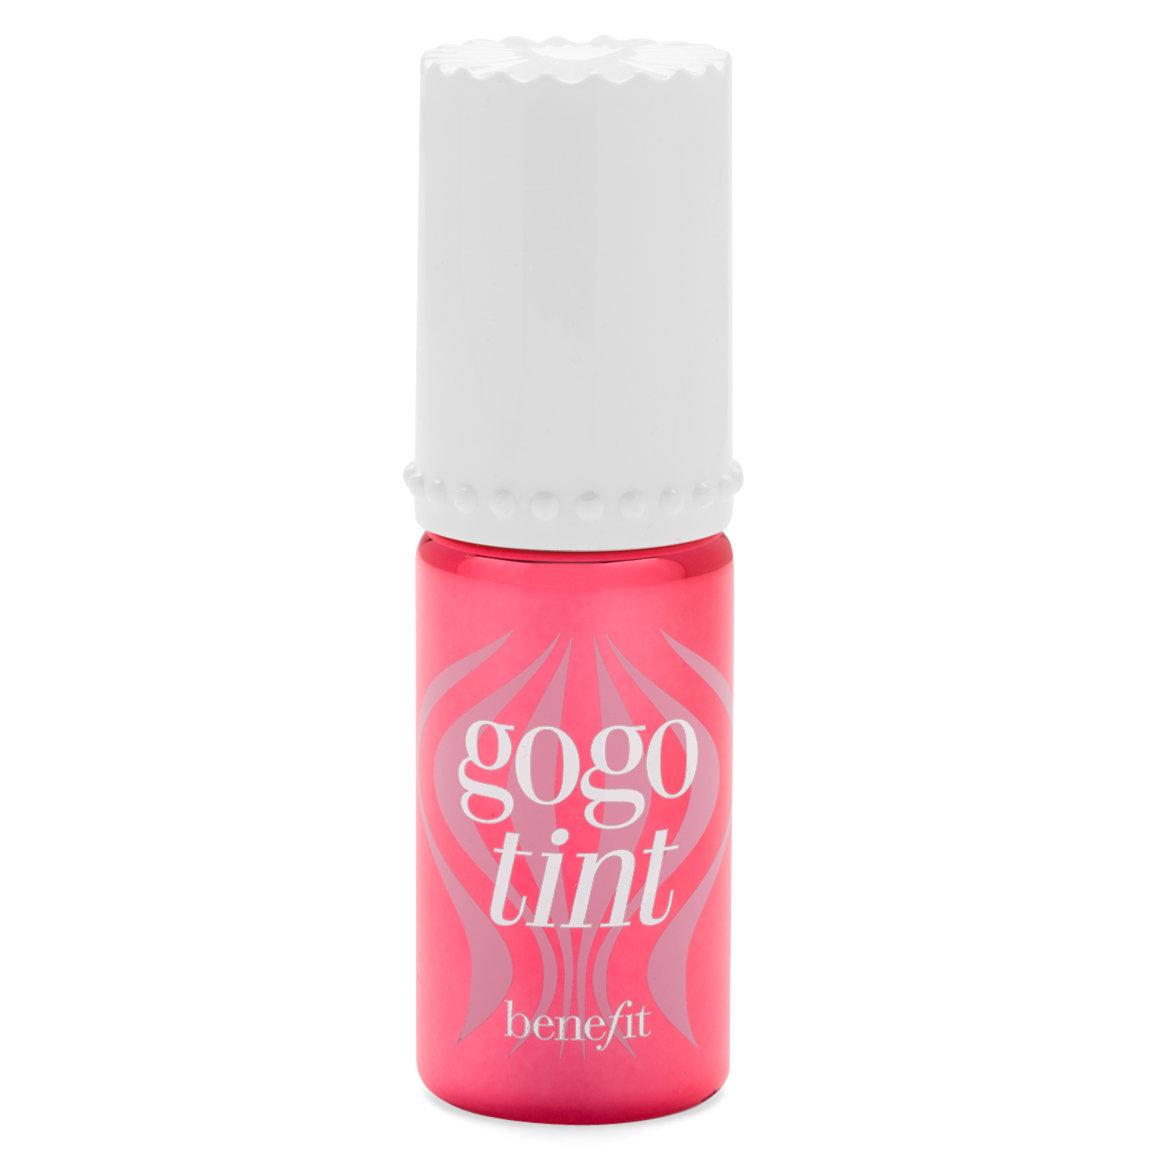 Benefit Cosmetics Gogotint Cheek & Lip Stain 6 ml product swatch.